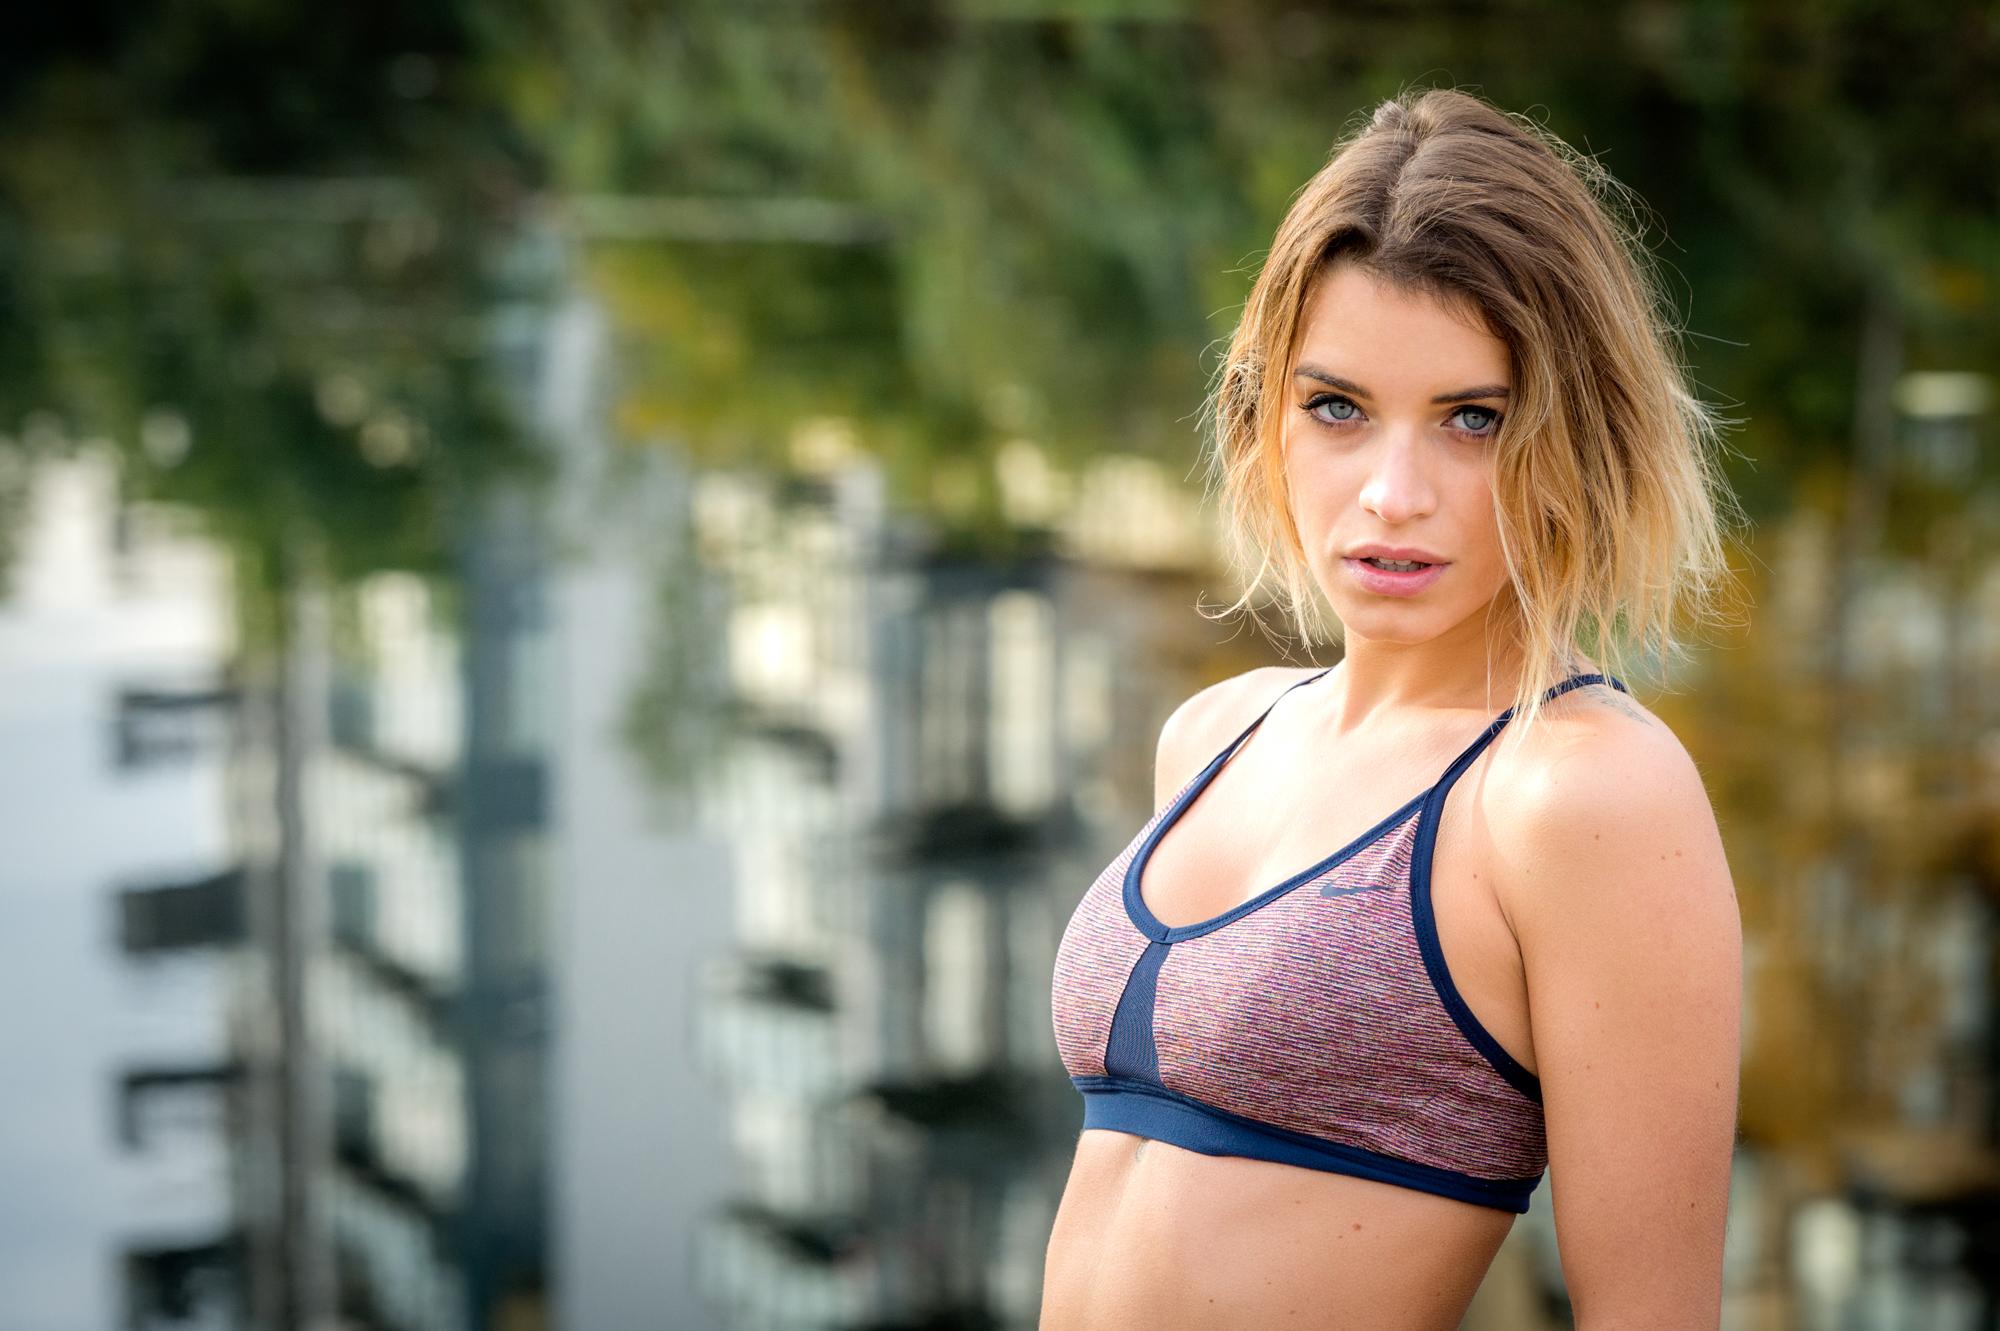 Celebrity Valentina Georgia Pegorer nudes (27 photos), Sexy, Cleavage, Twitter, braless 2017